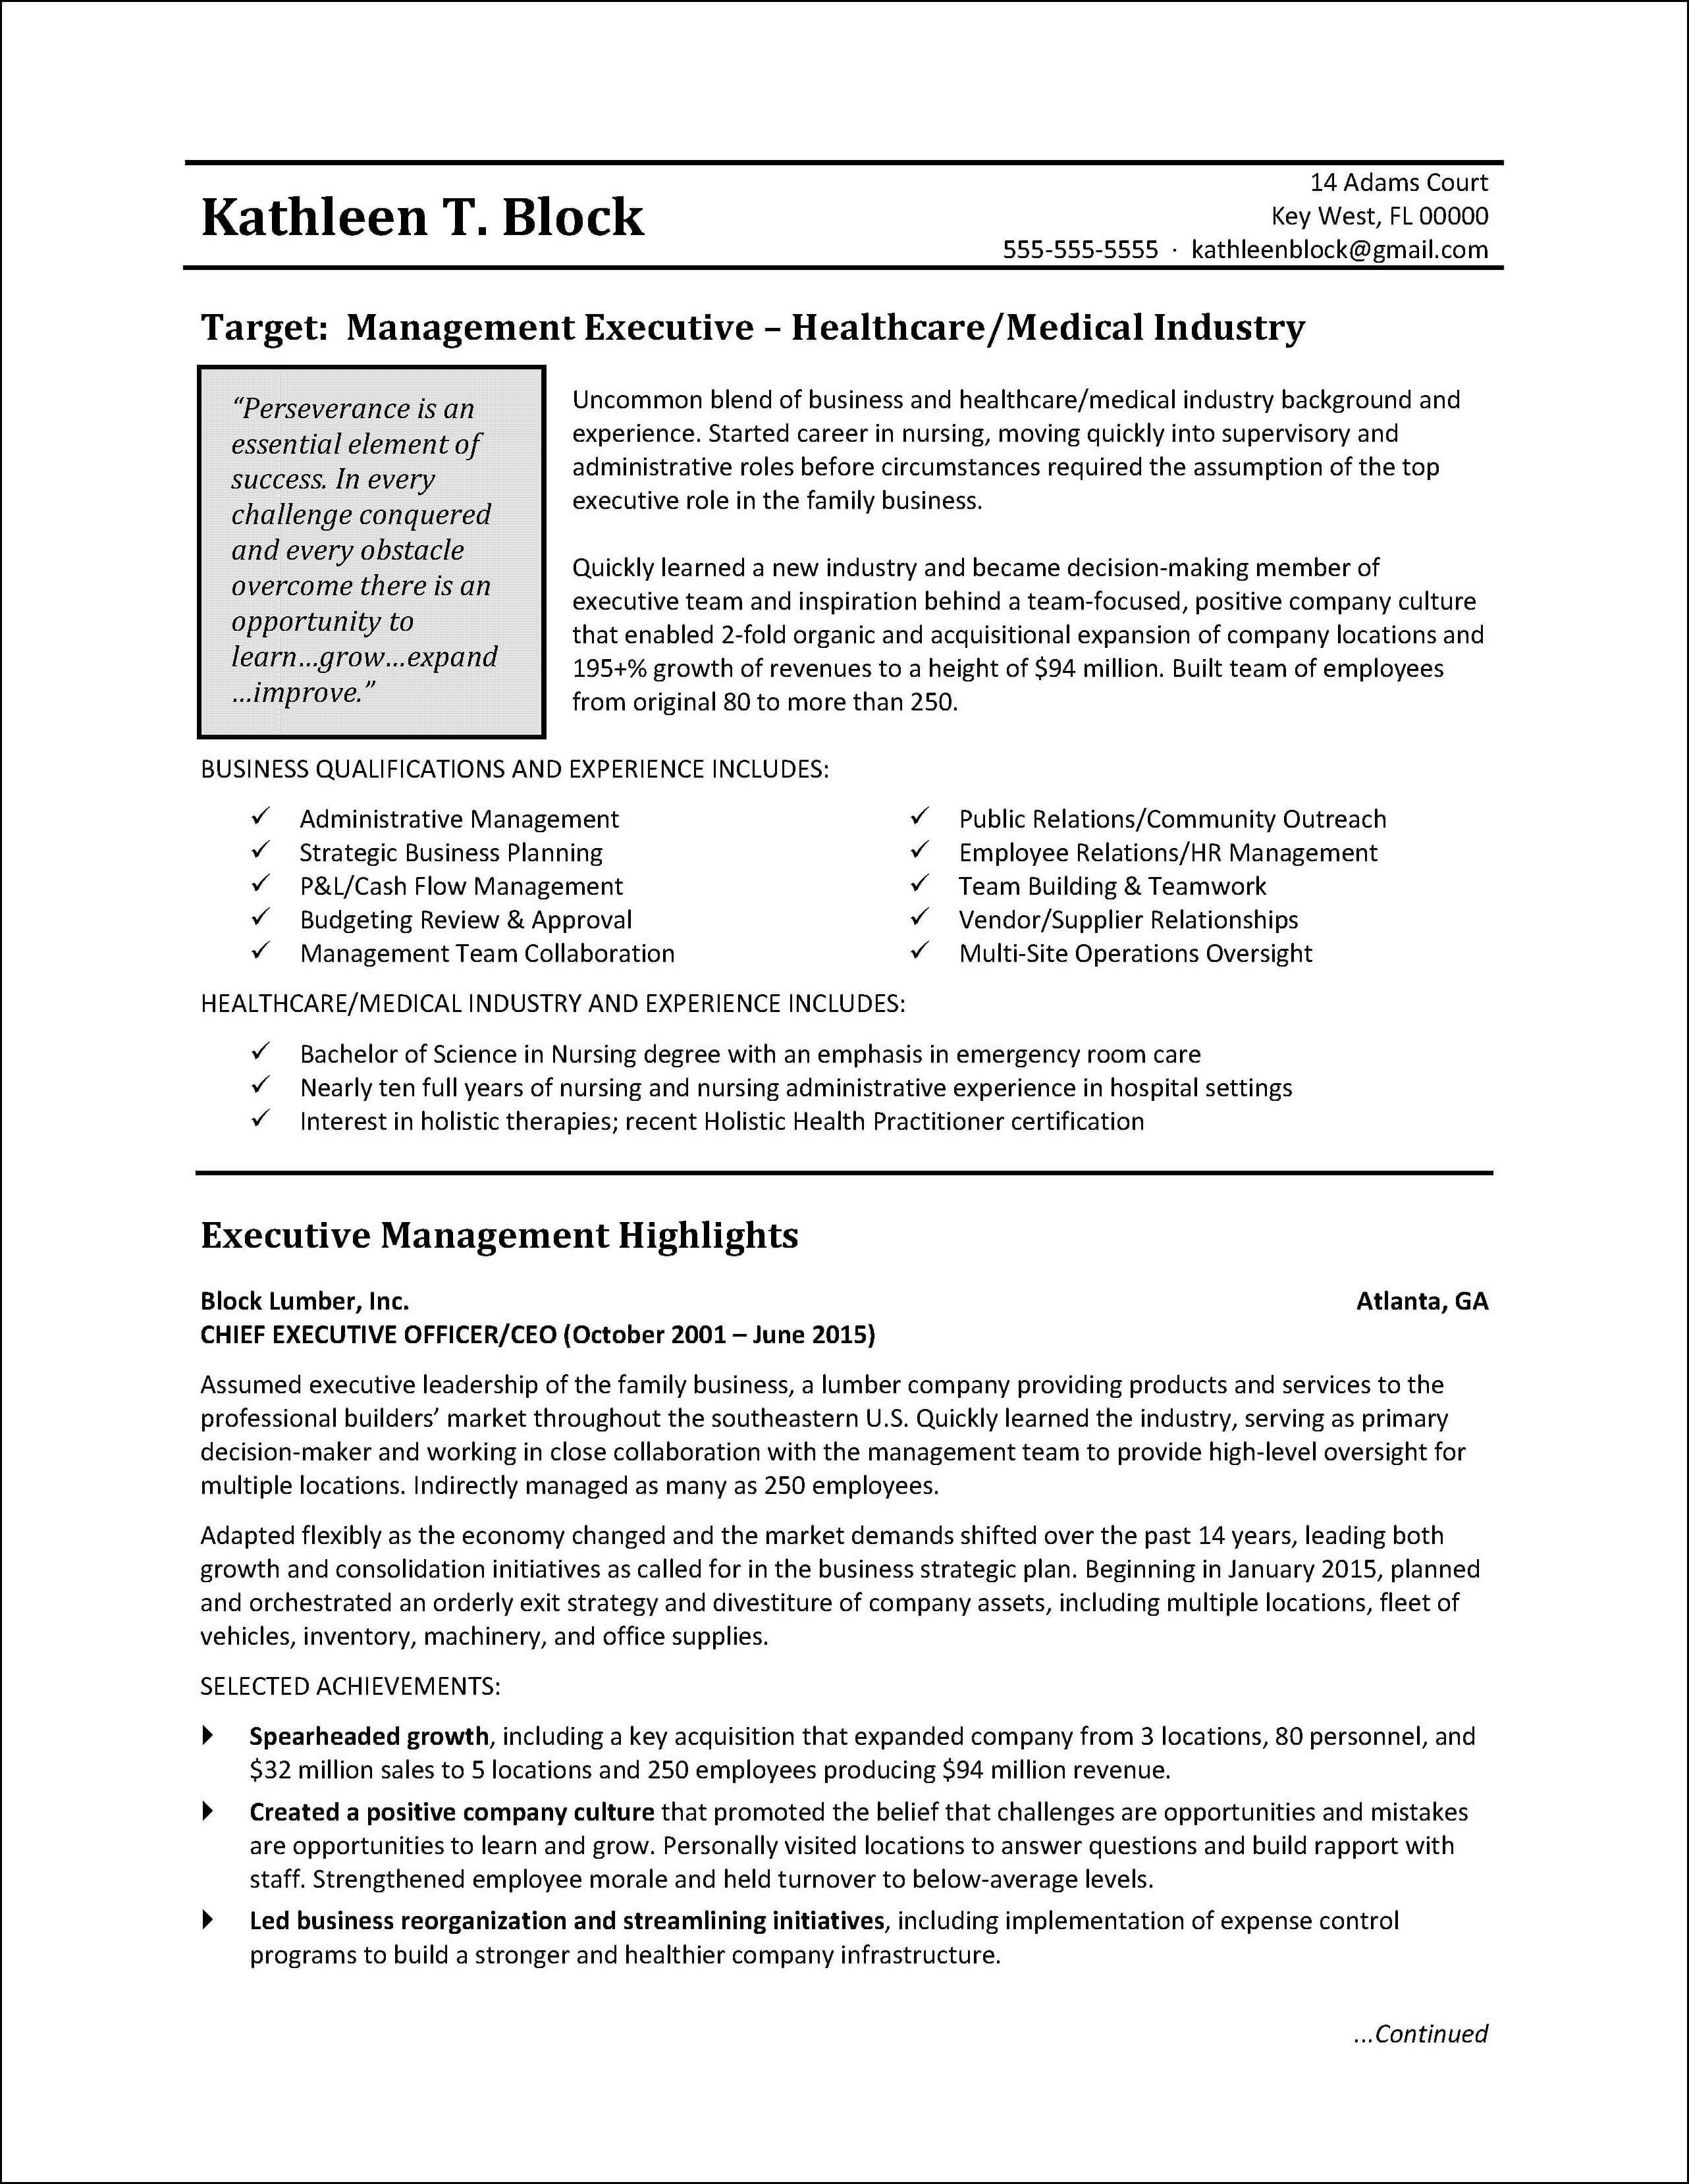 Management Resume Sample | Healthcare Industry